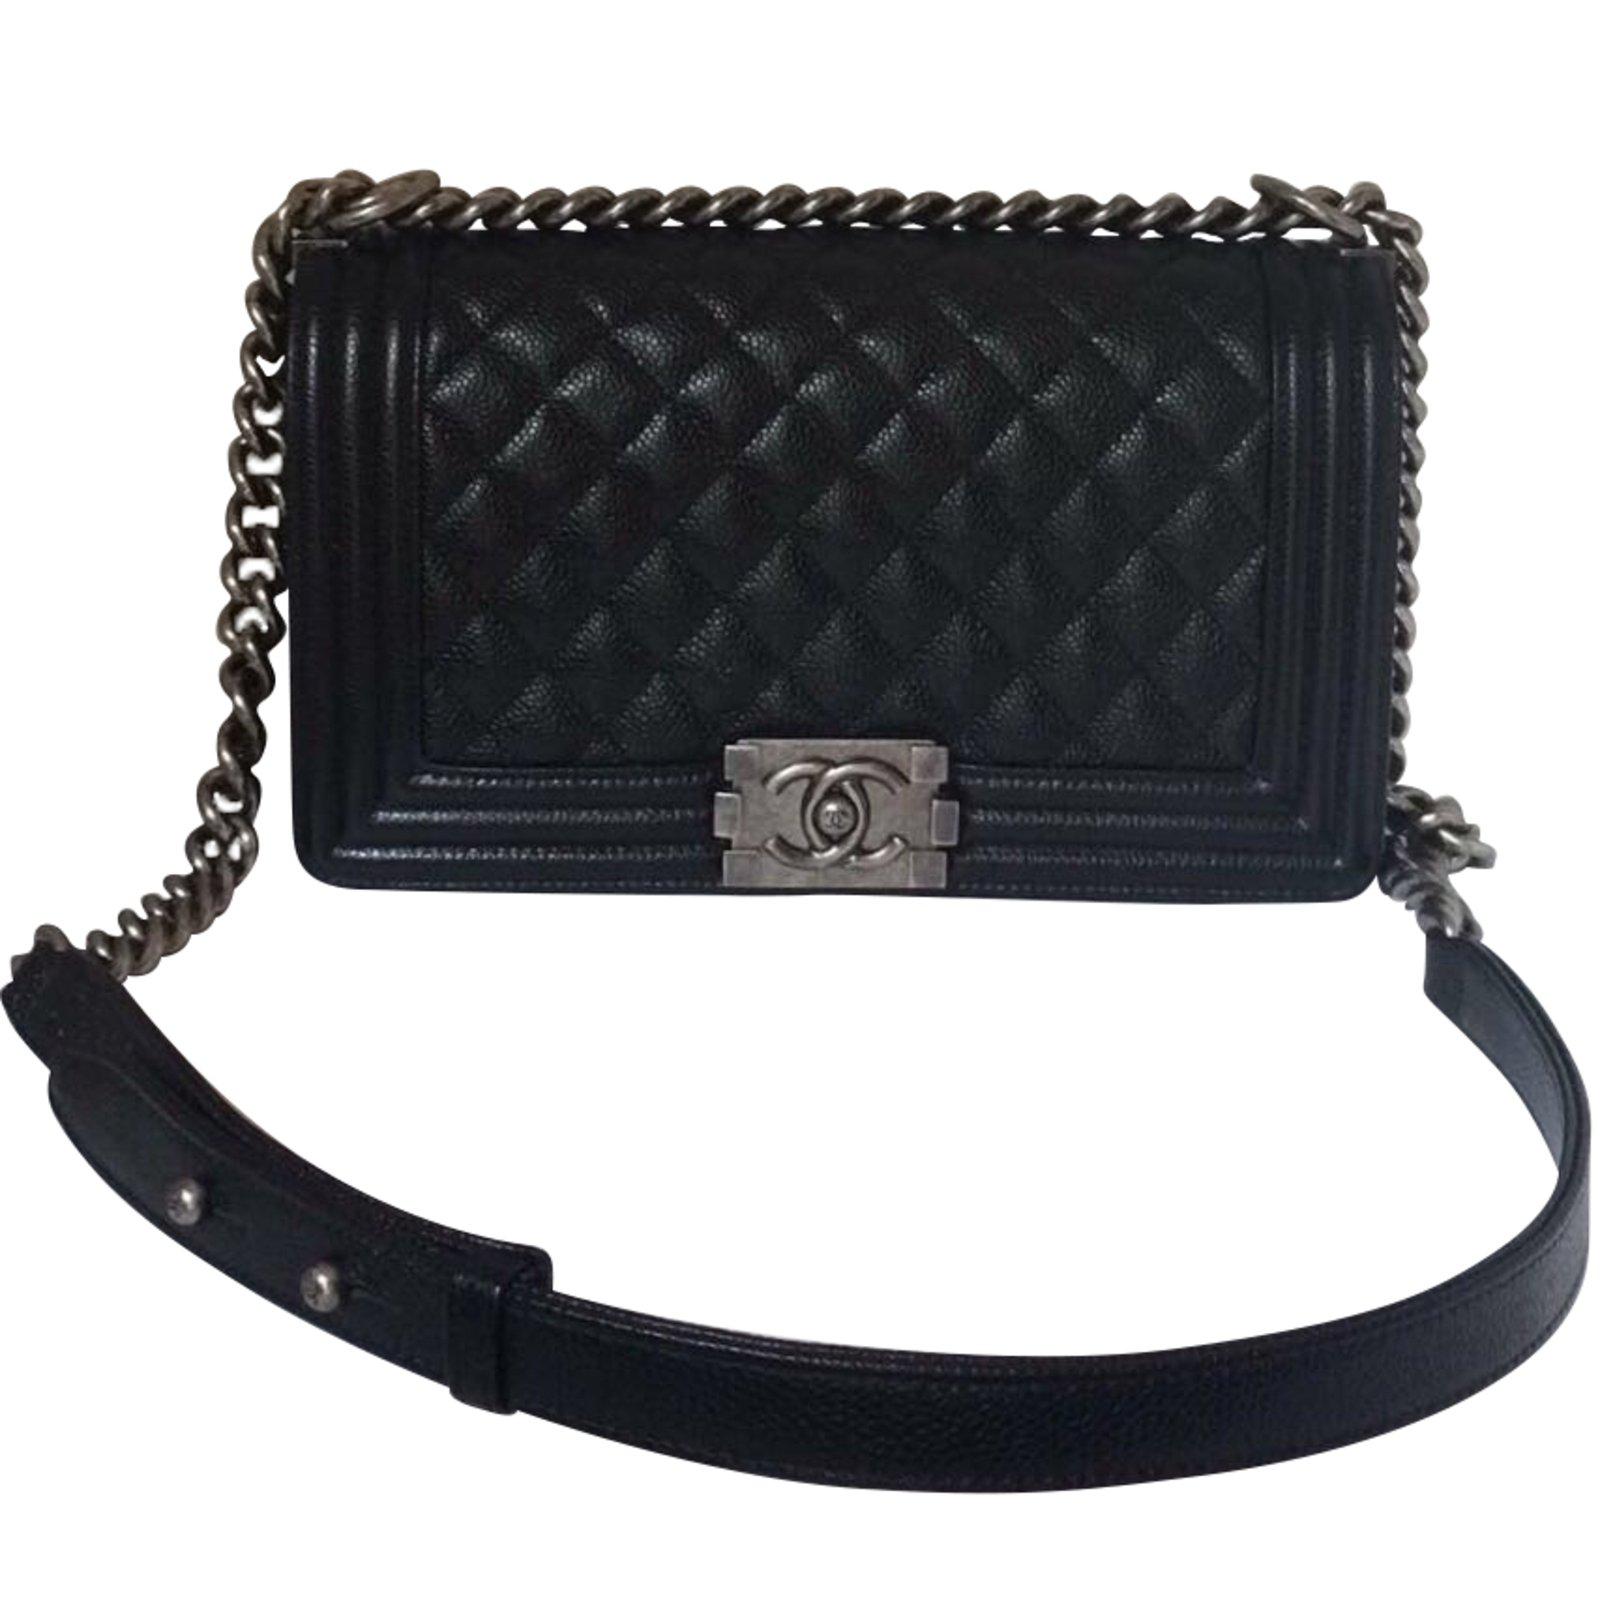 handbags dotcom small quilt pale bag ref womens quilted blue leather fendi women bags en shoulder designers